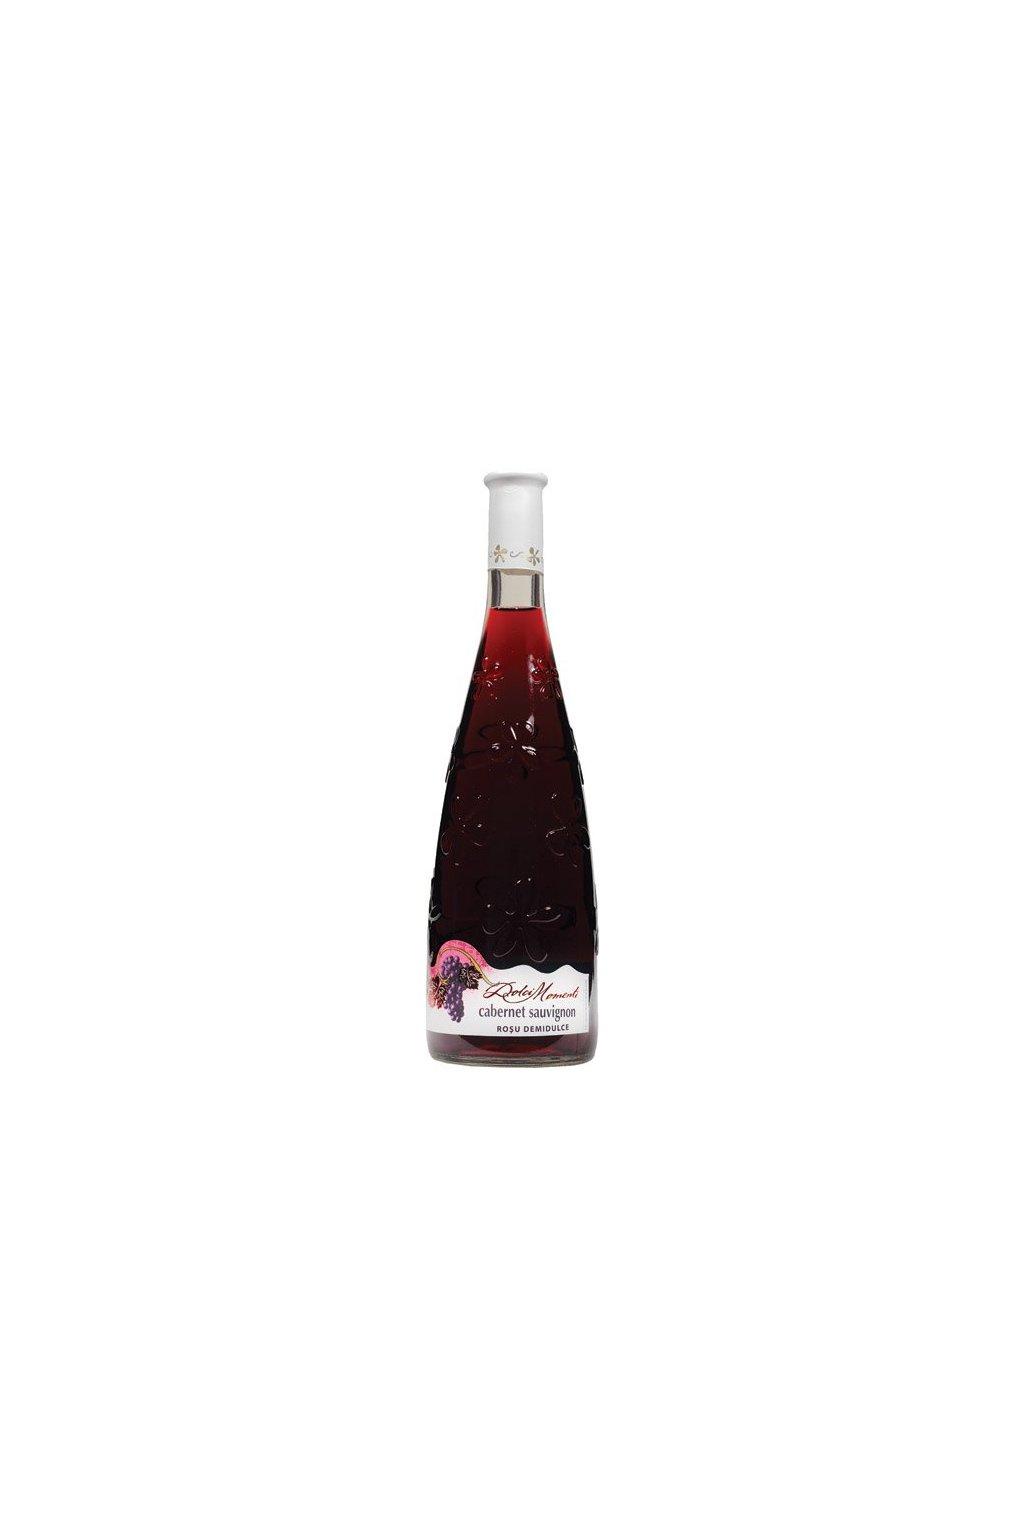 vartely cabernet sauvignon